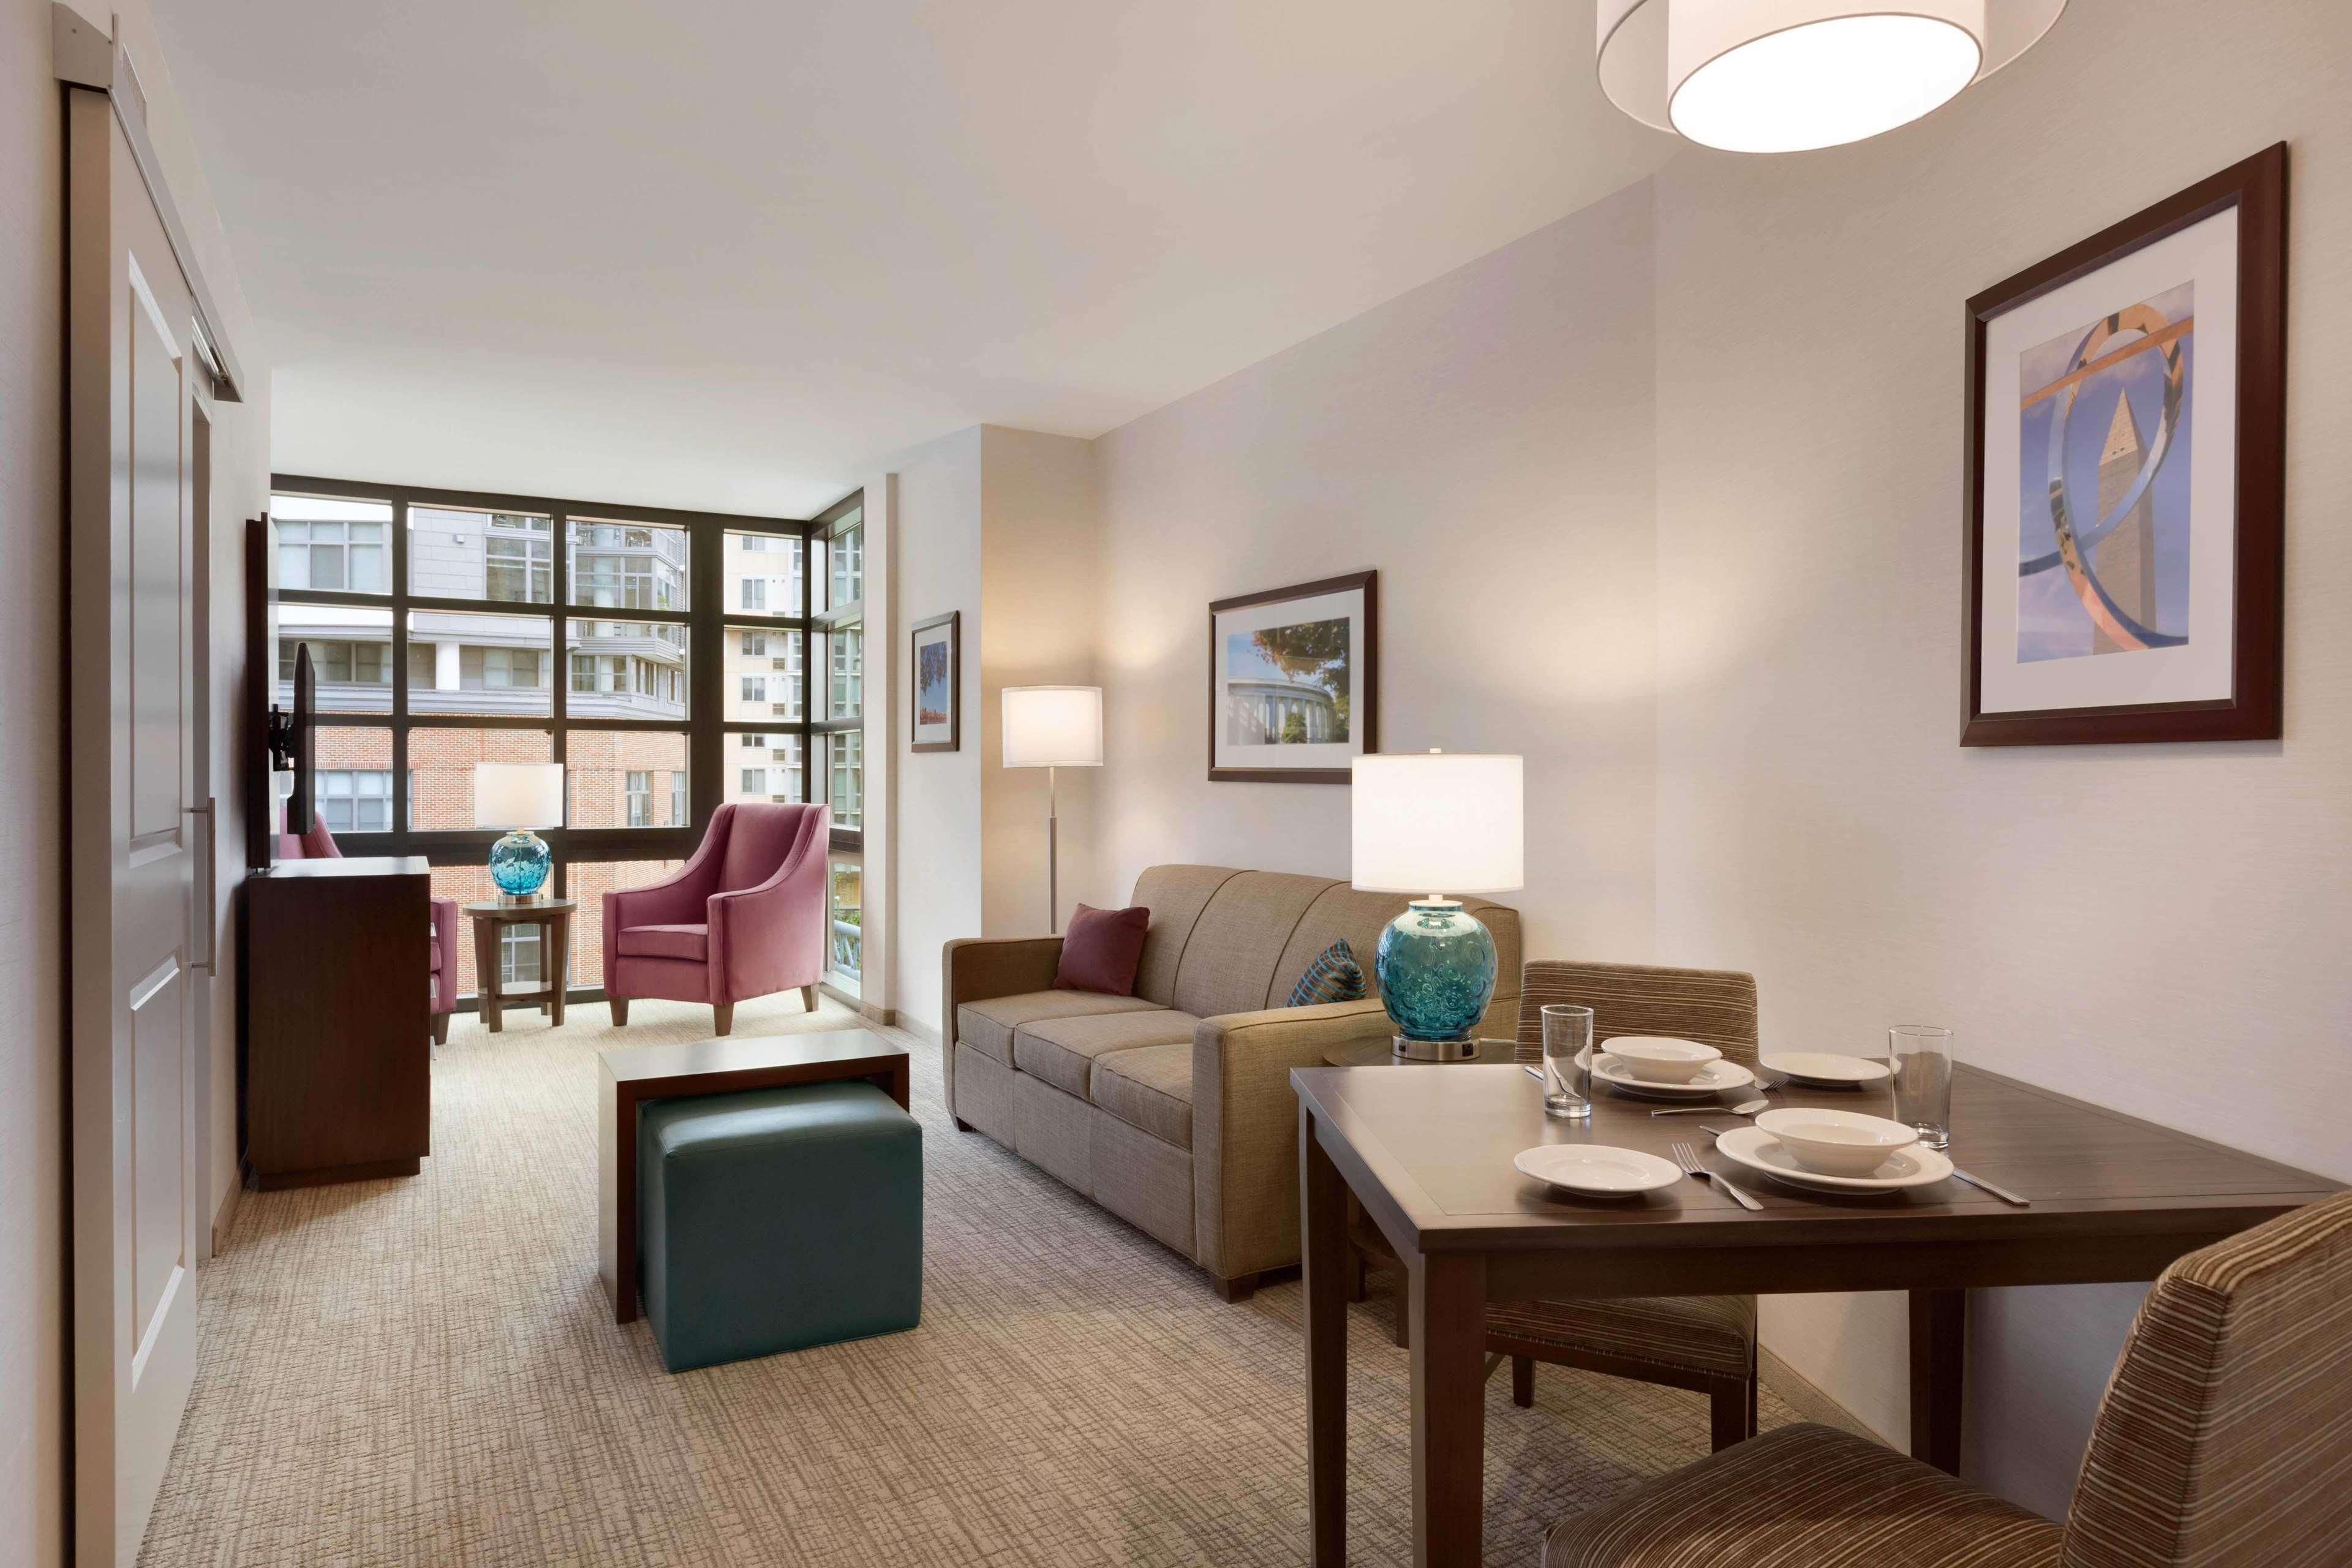 Homewood Suites by Hilton Washington DC Convention Center image 26